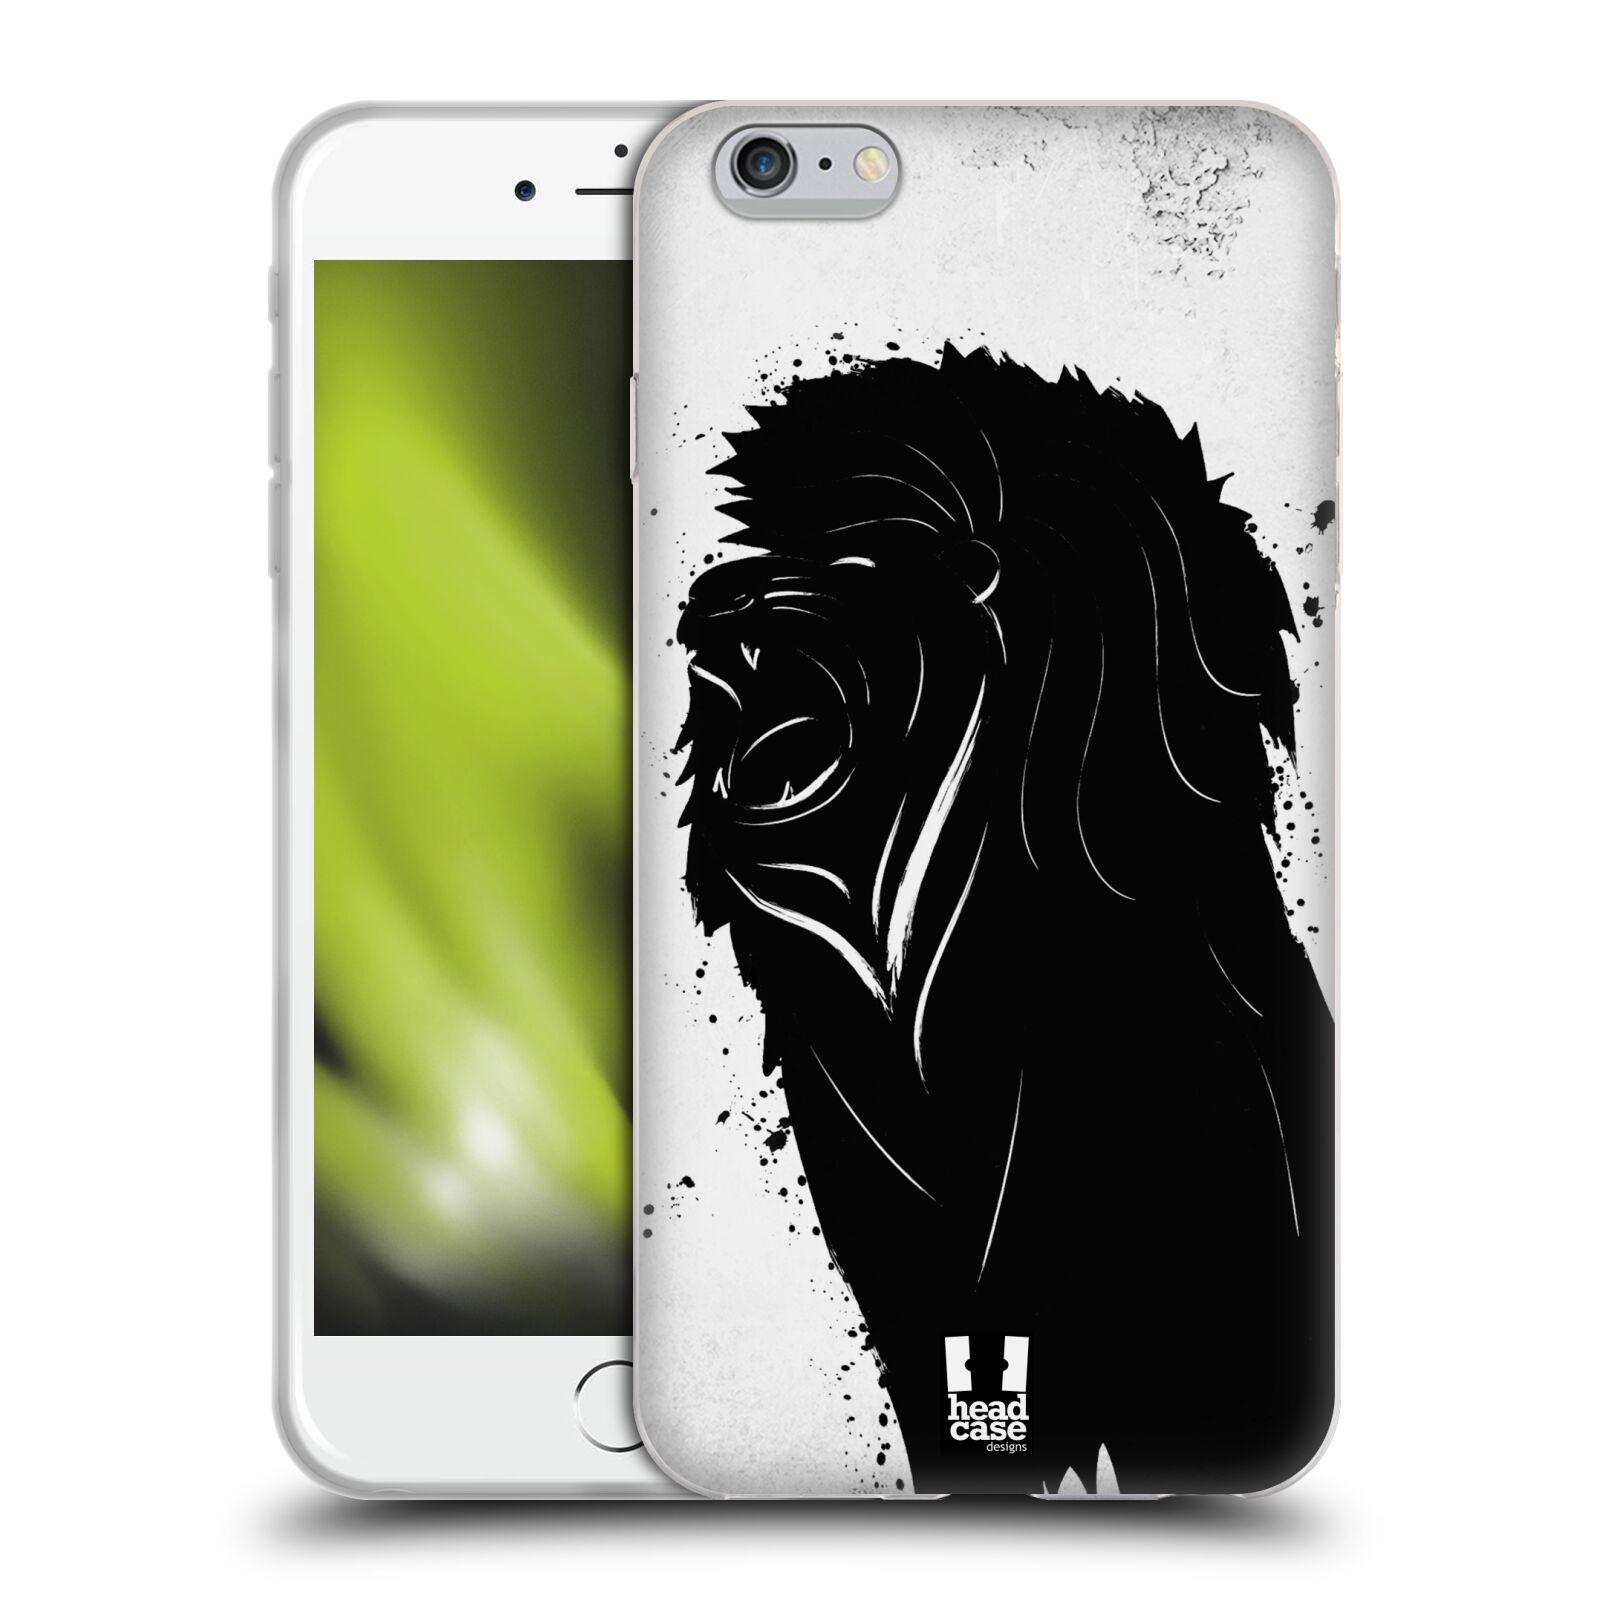 HEAD CASE silikonový obal na mobil Apple Iphone 6 PLUS/ 6S PLUS vzor Kresba tuš zvíře lev